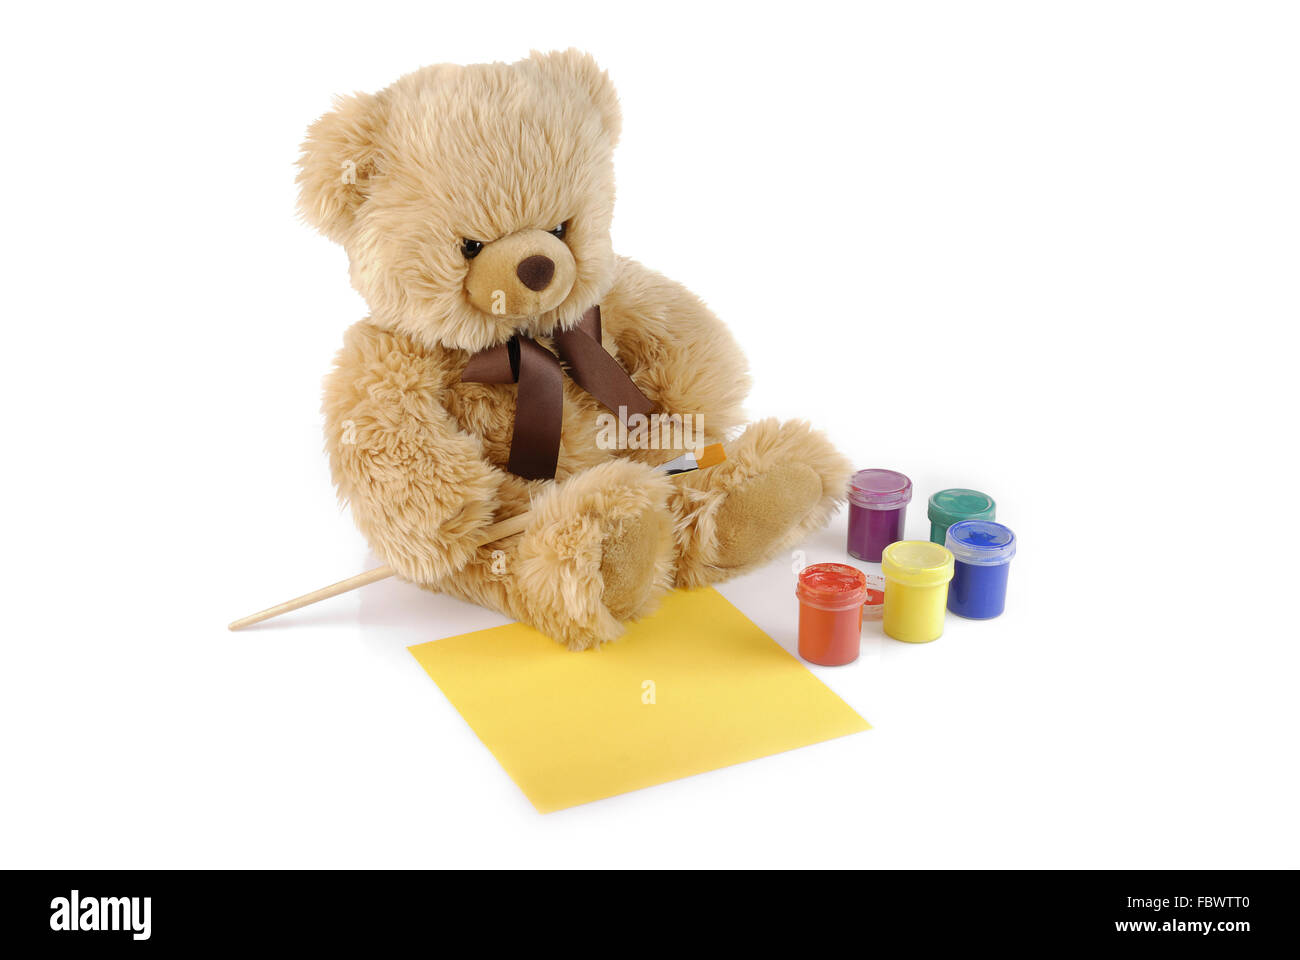 Cuddly White Teddy Bear Red Stockfotos & Cuddly White Teddy Bear Red ...